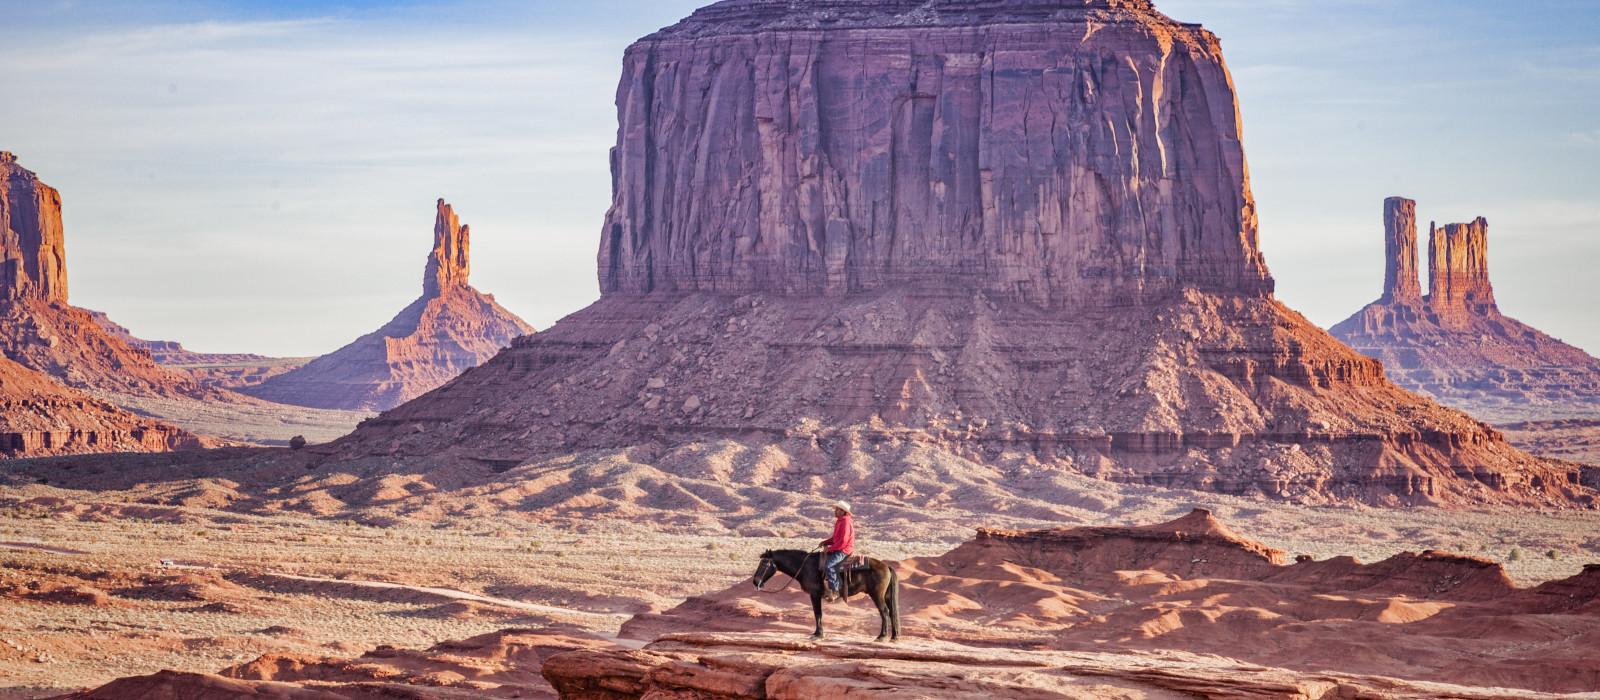 Destination Monument Valley Navajo Tribal Park USA